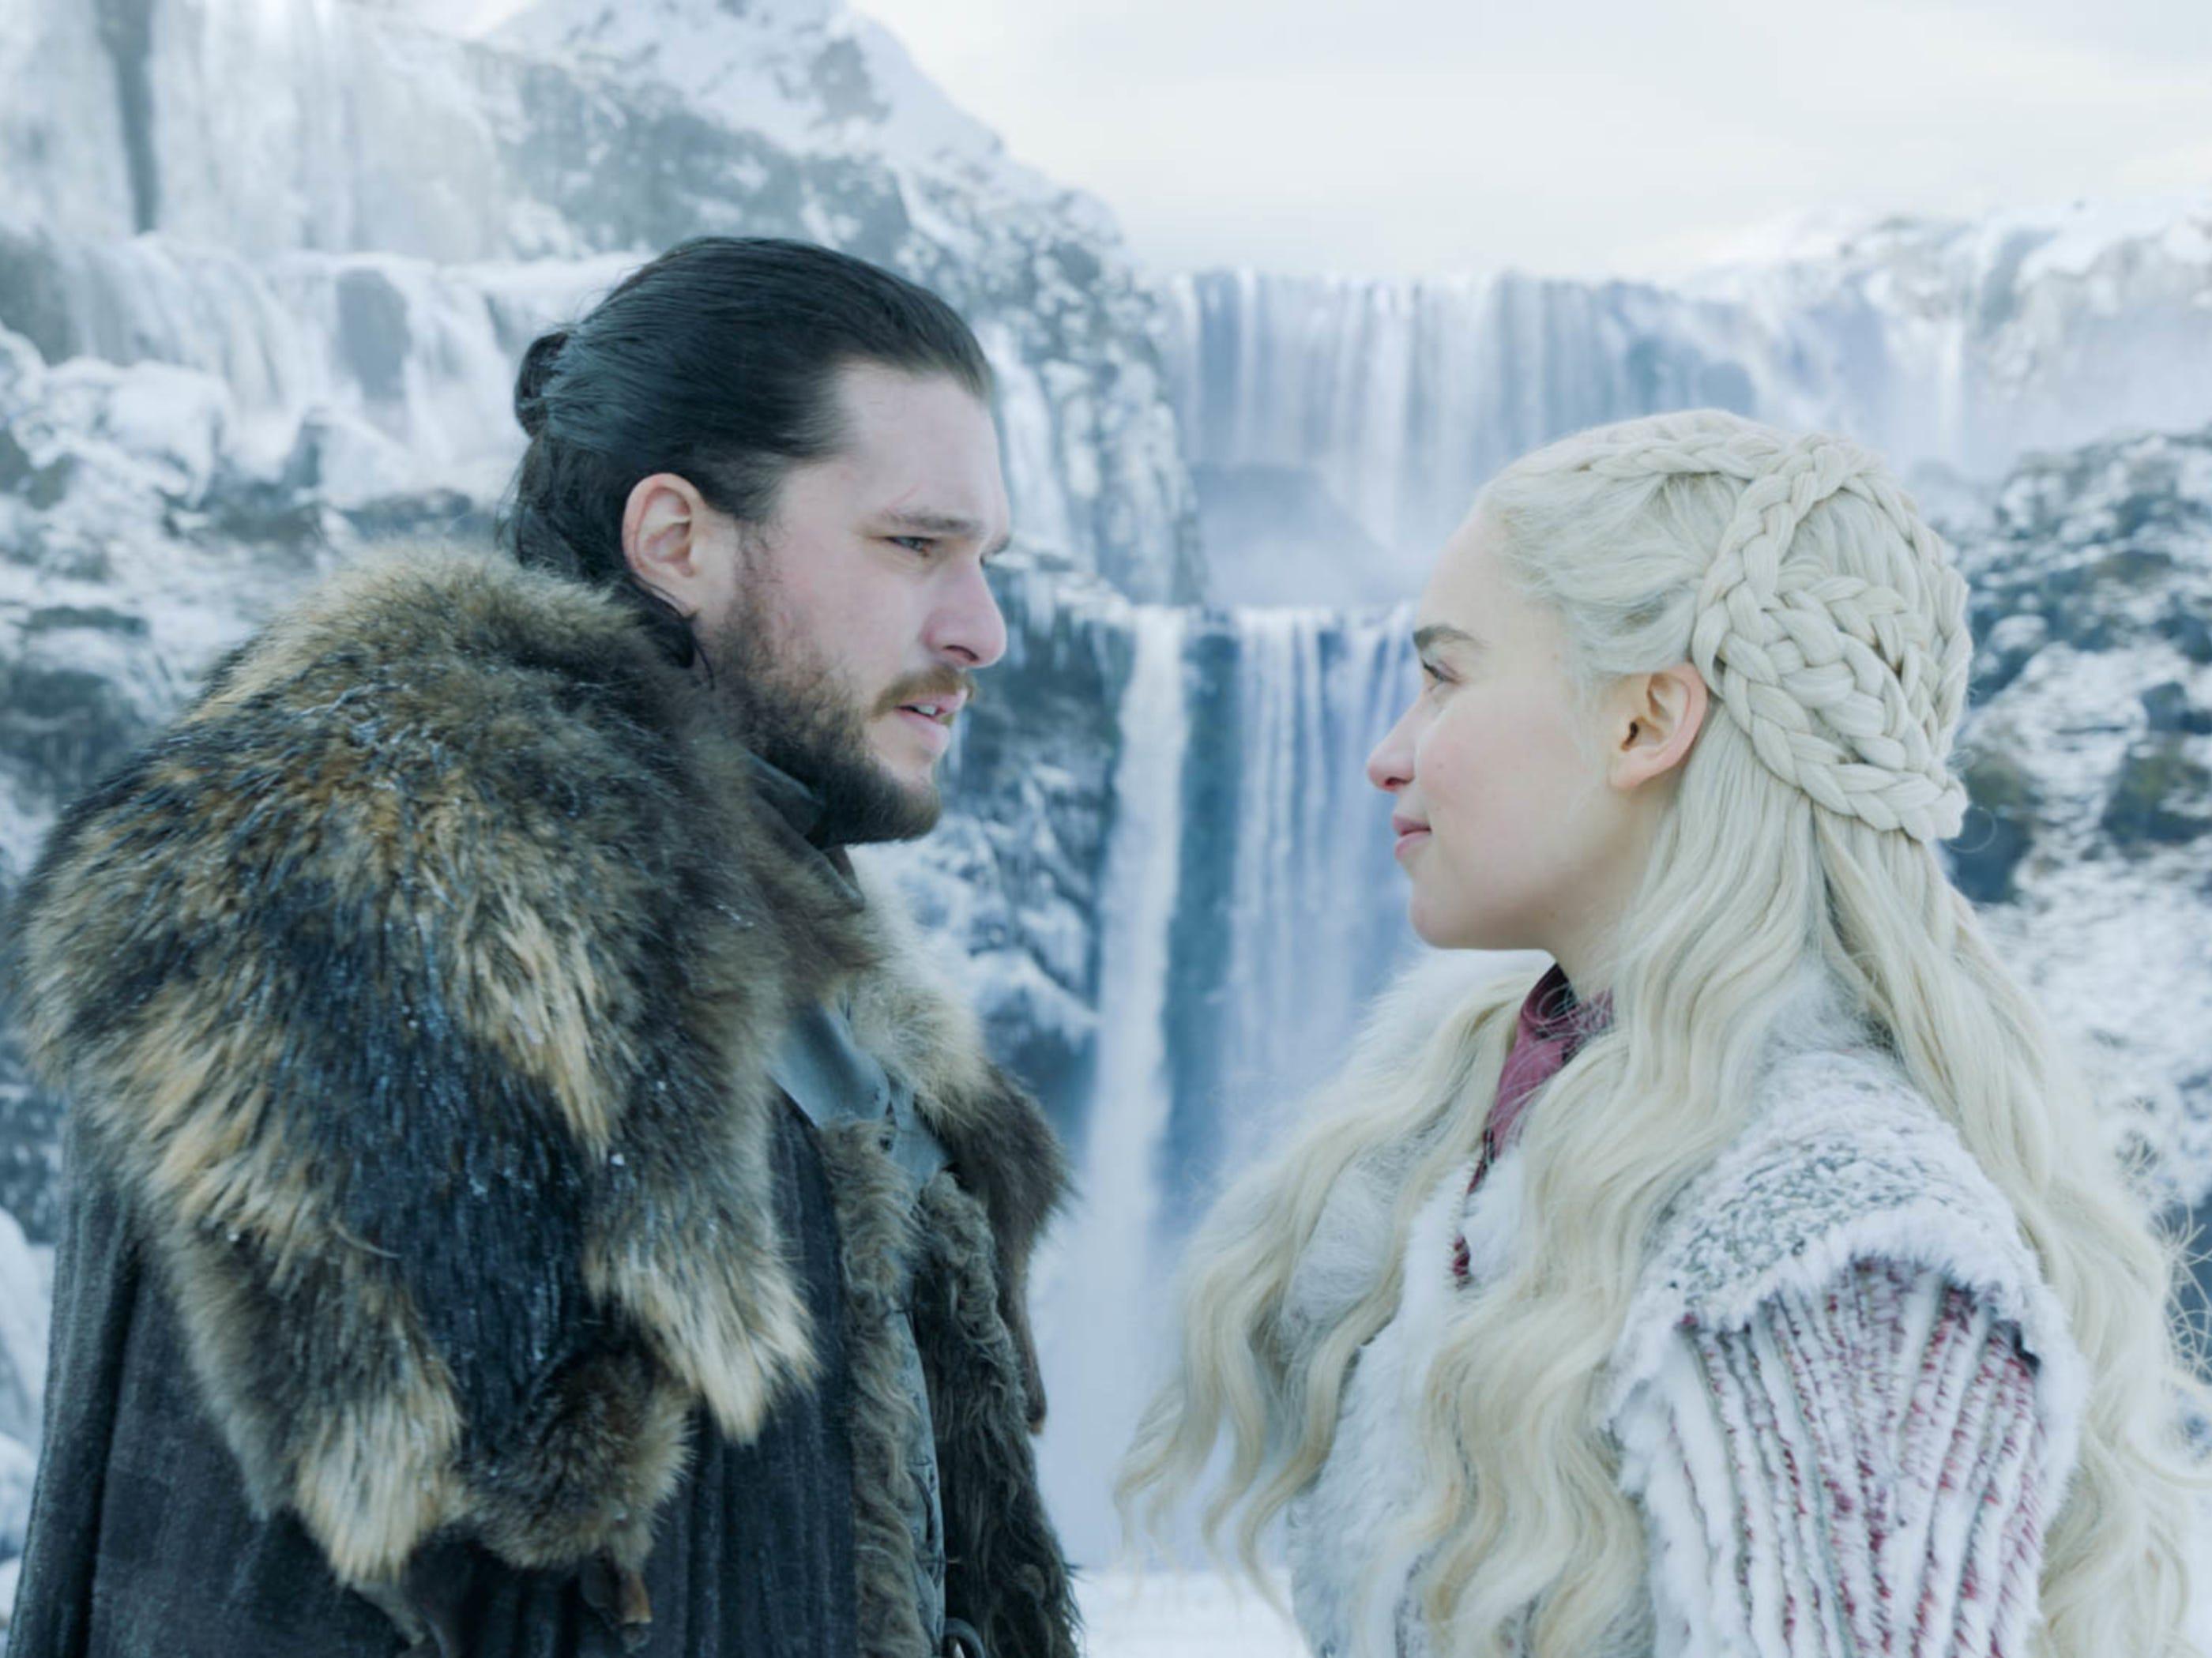 Jon Snow (Kit Harington) shows Daenerys Targaryen (Emilia Clarke) some of the North.